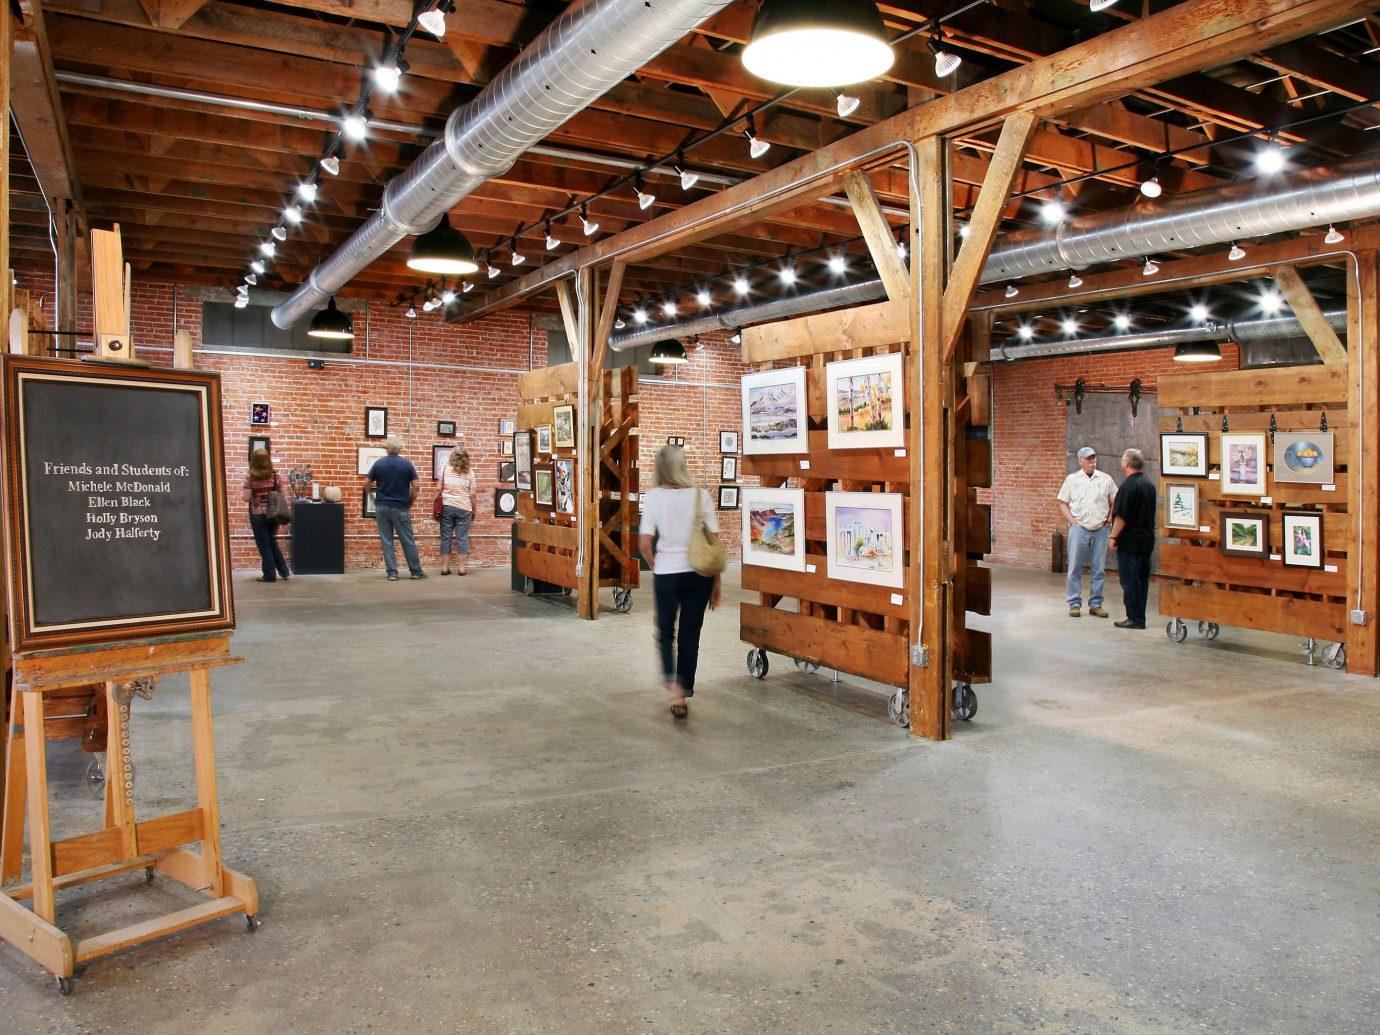 Trip Ideas building indoor floor transport ceiling wood stall public transport tourist attraction